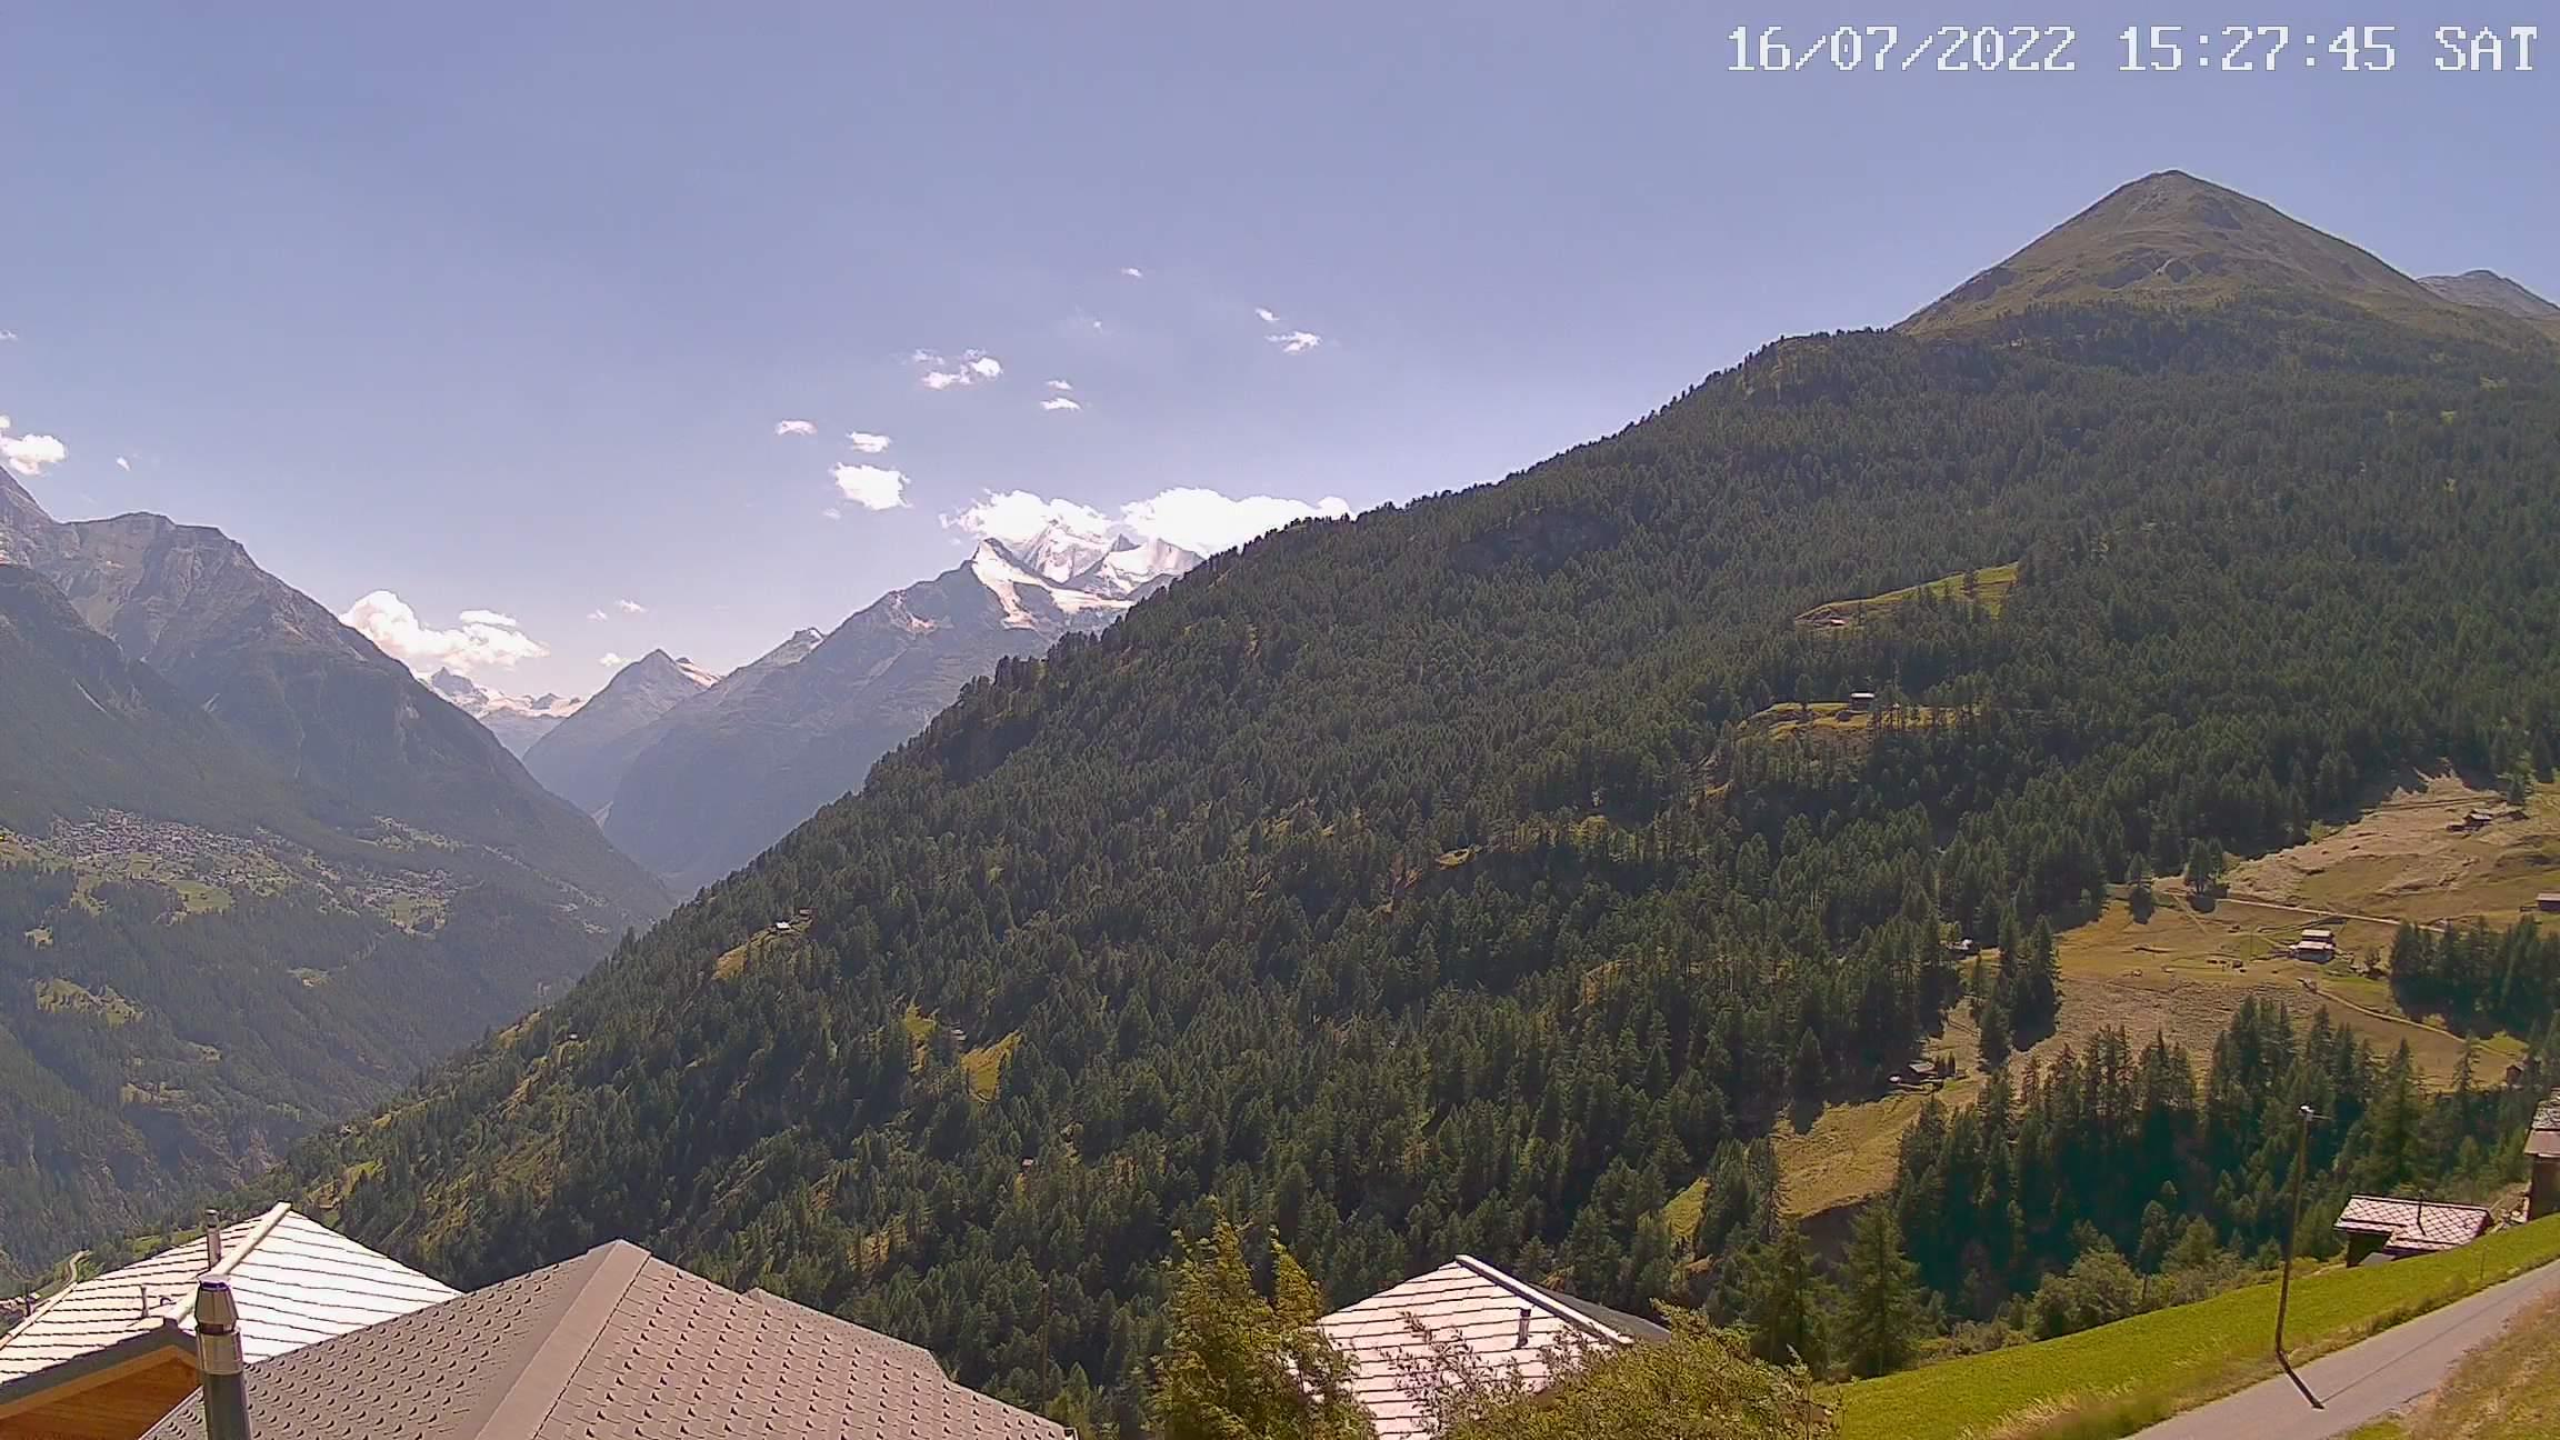 Webcam «Chalte Brunne» - Moosalp